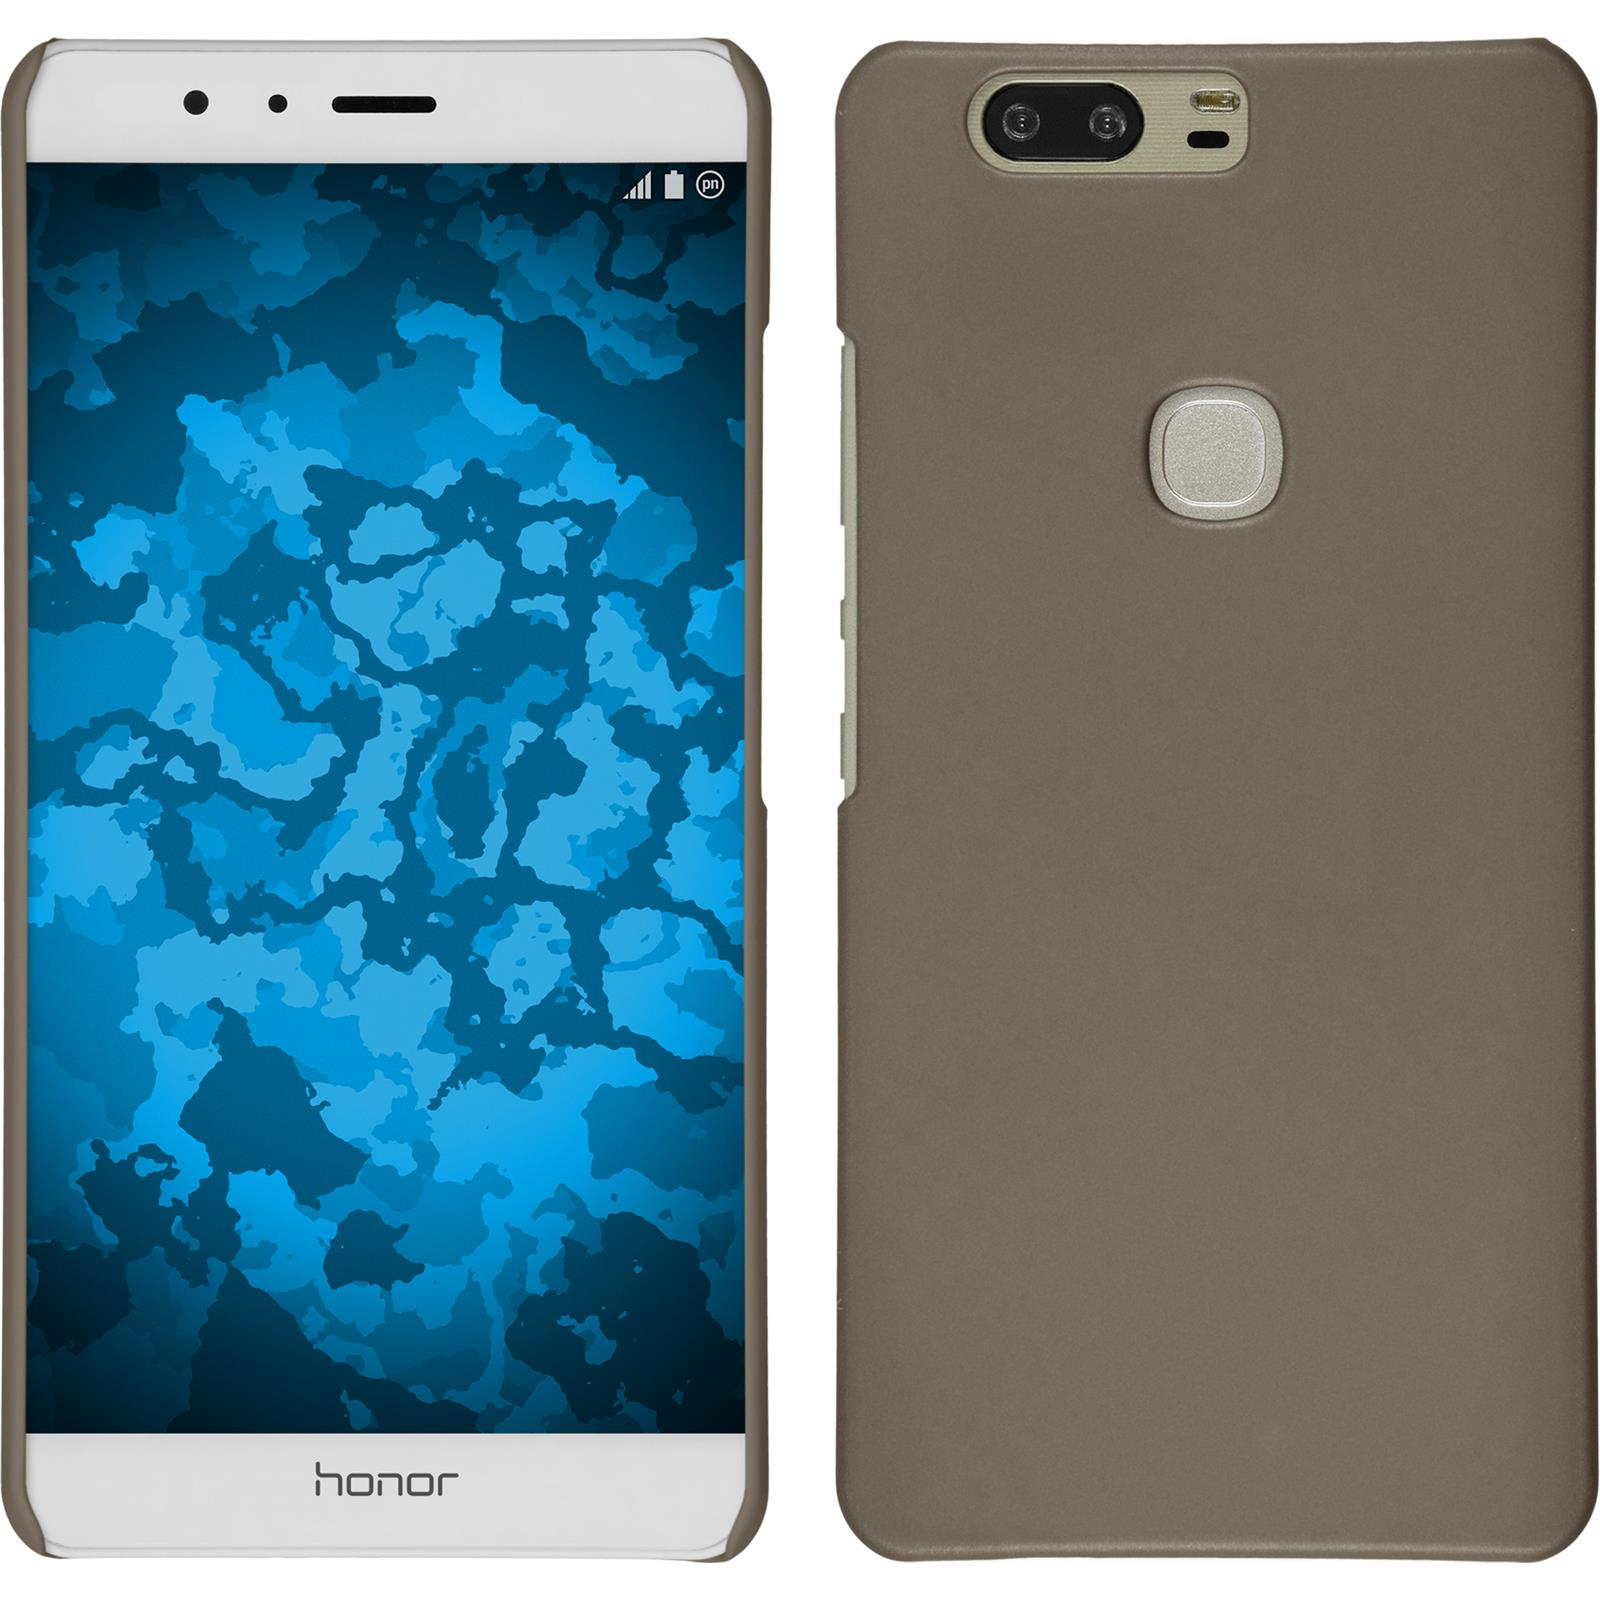 Funda-Rigida-Huawei-Honor-V8-goma-protector-de-pantalla